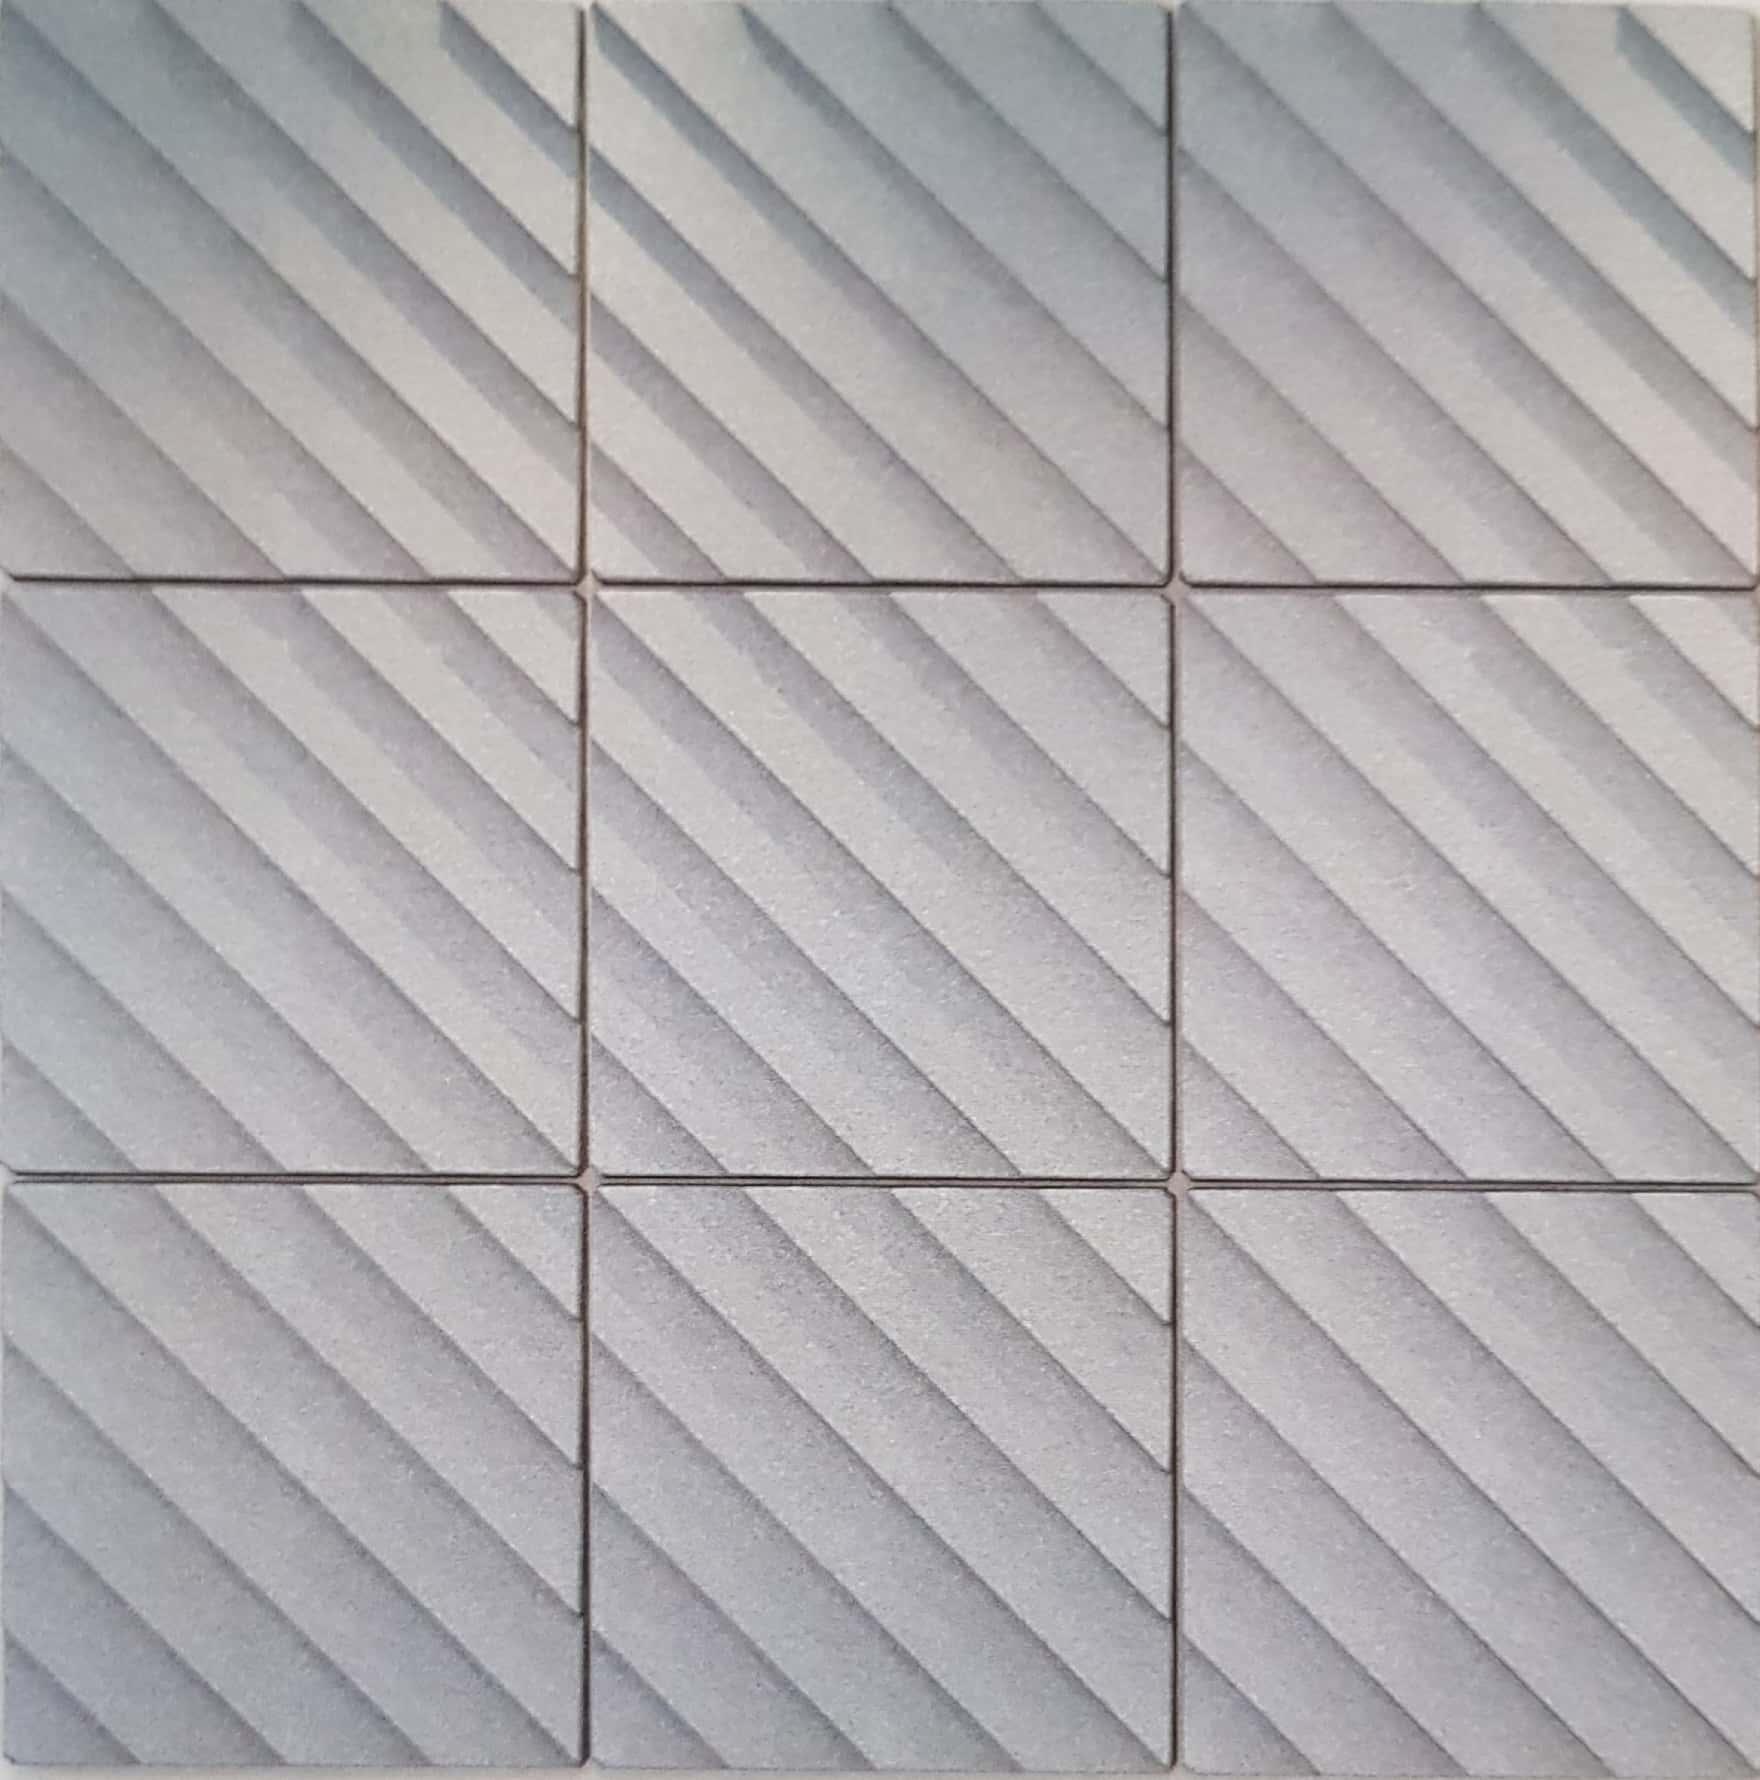 Acoustek tiles - Metro